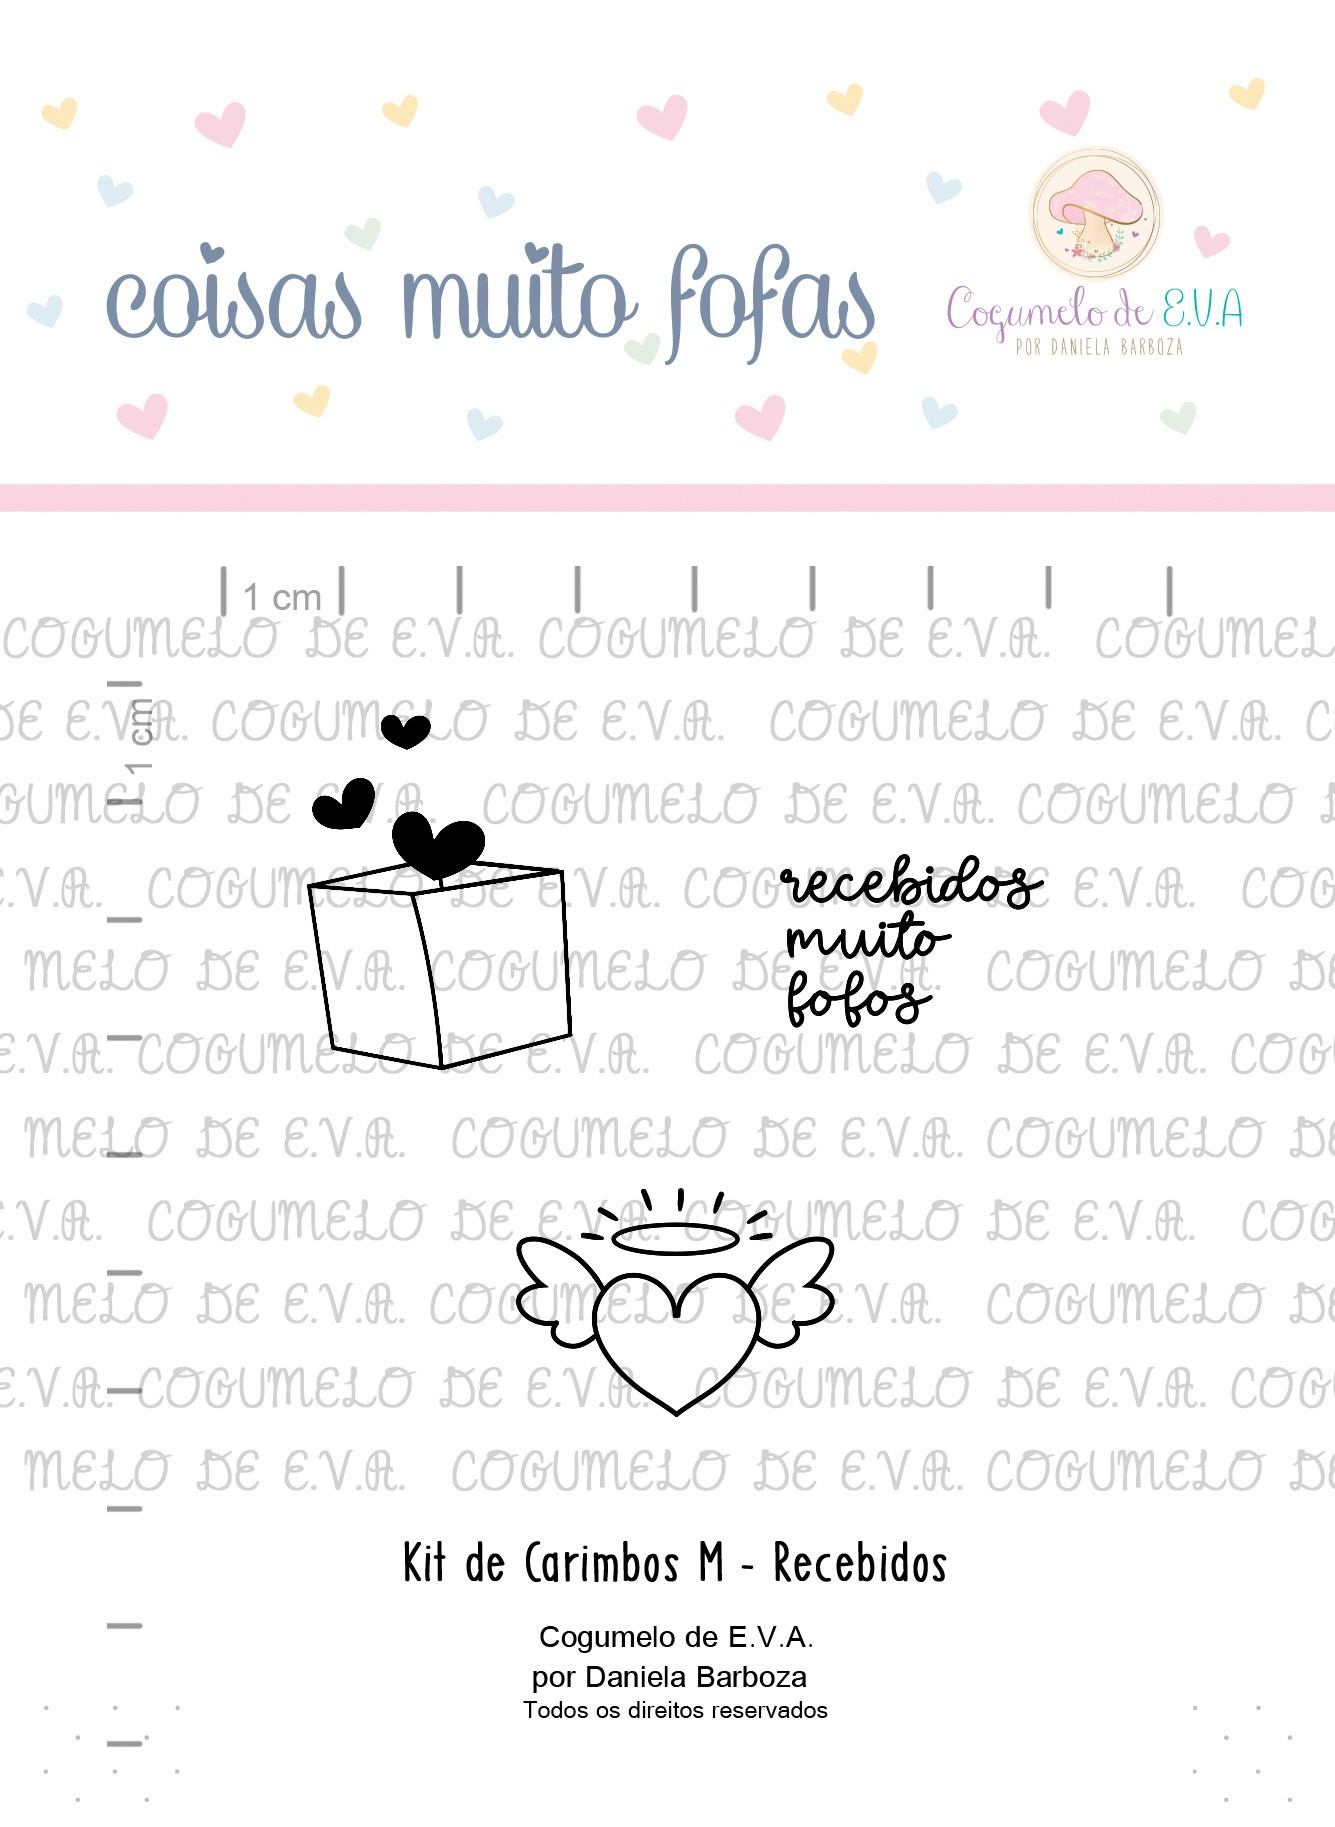 "Cartela de Carimbos M - ""Recebidos"" - Cogumelo de E.V.A.  - Lilipop carimbos"